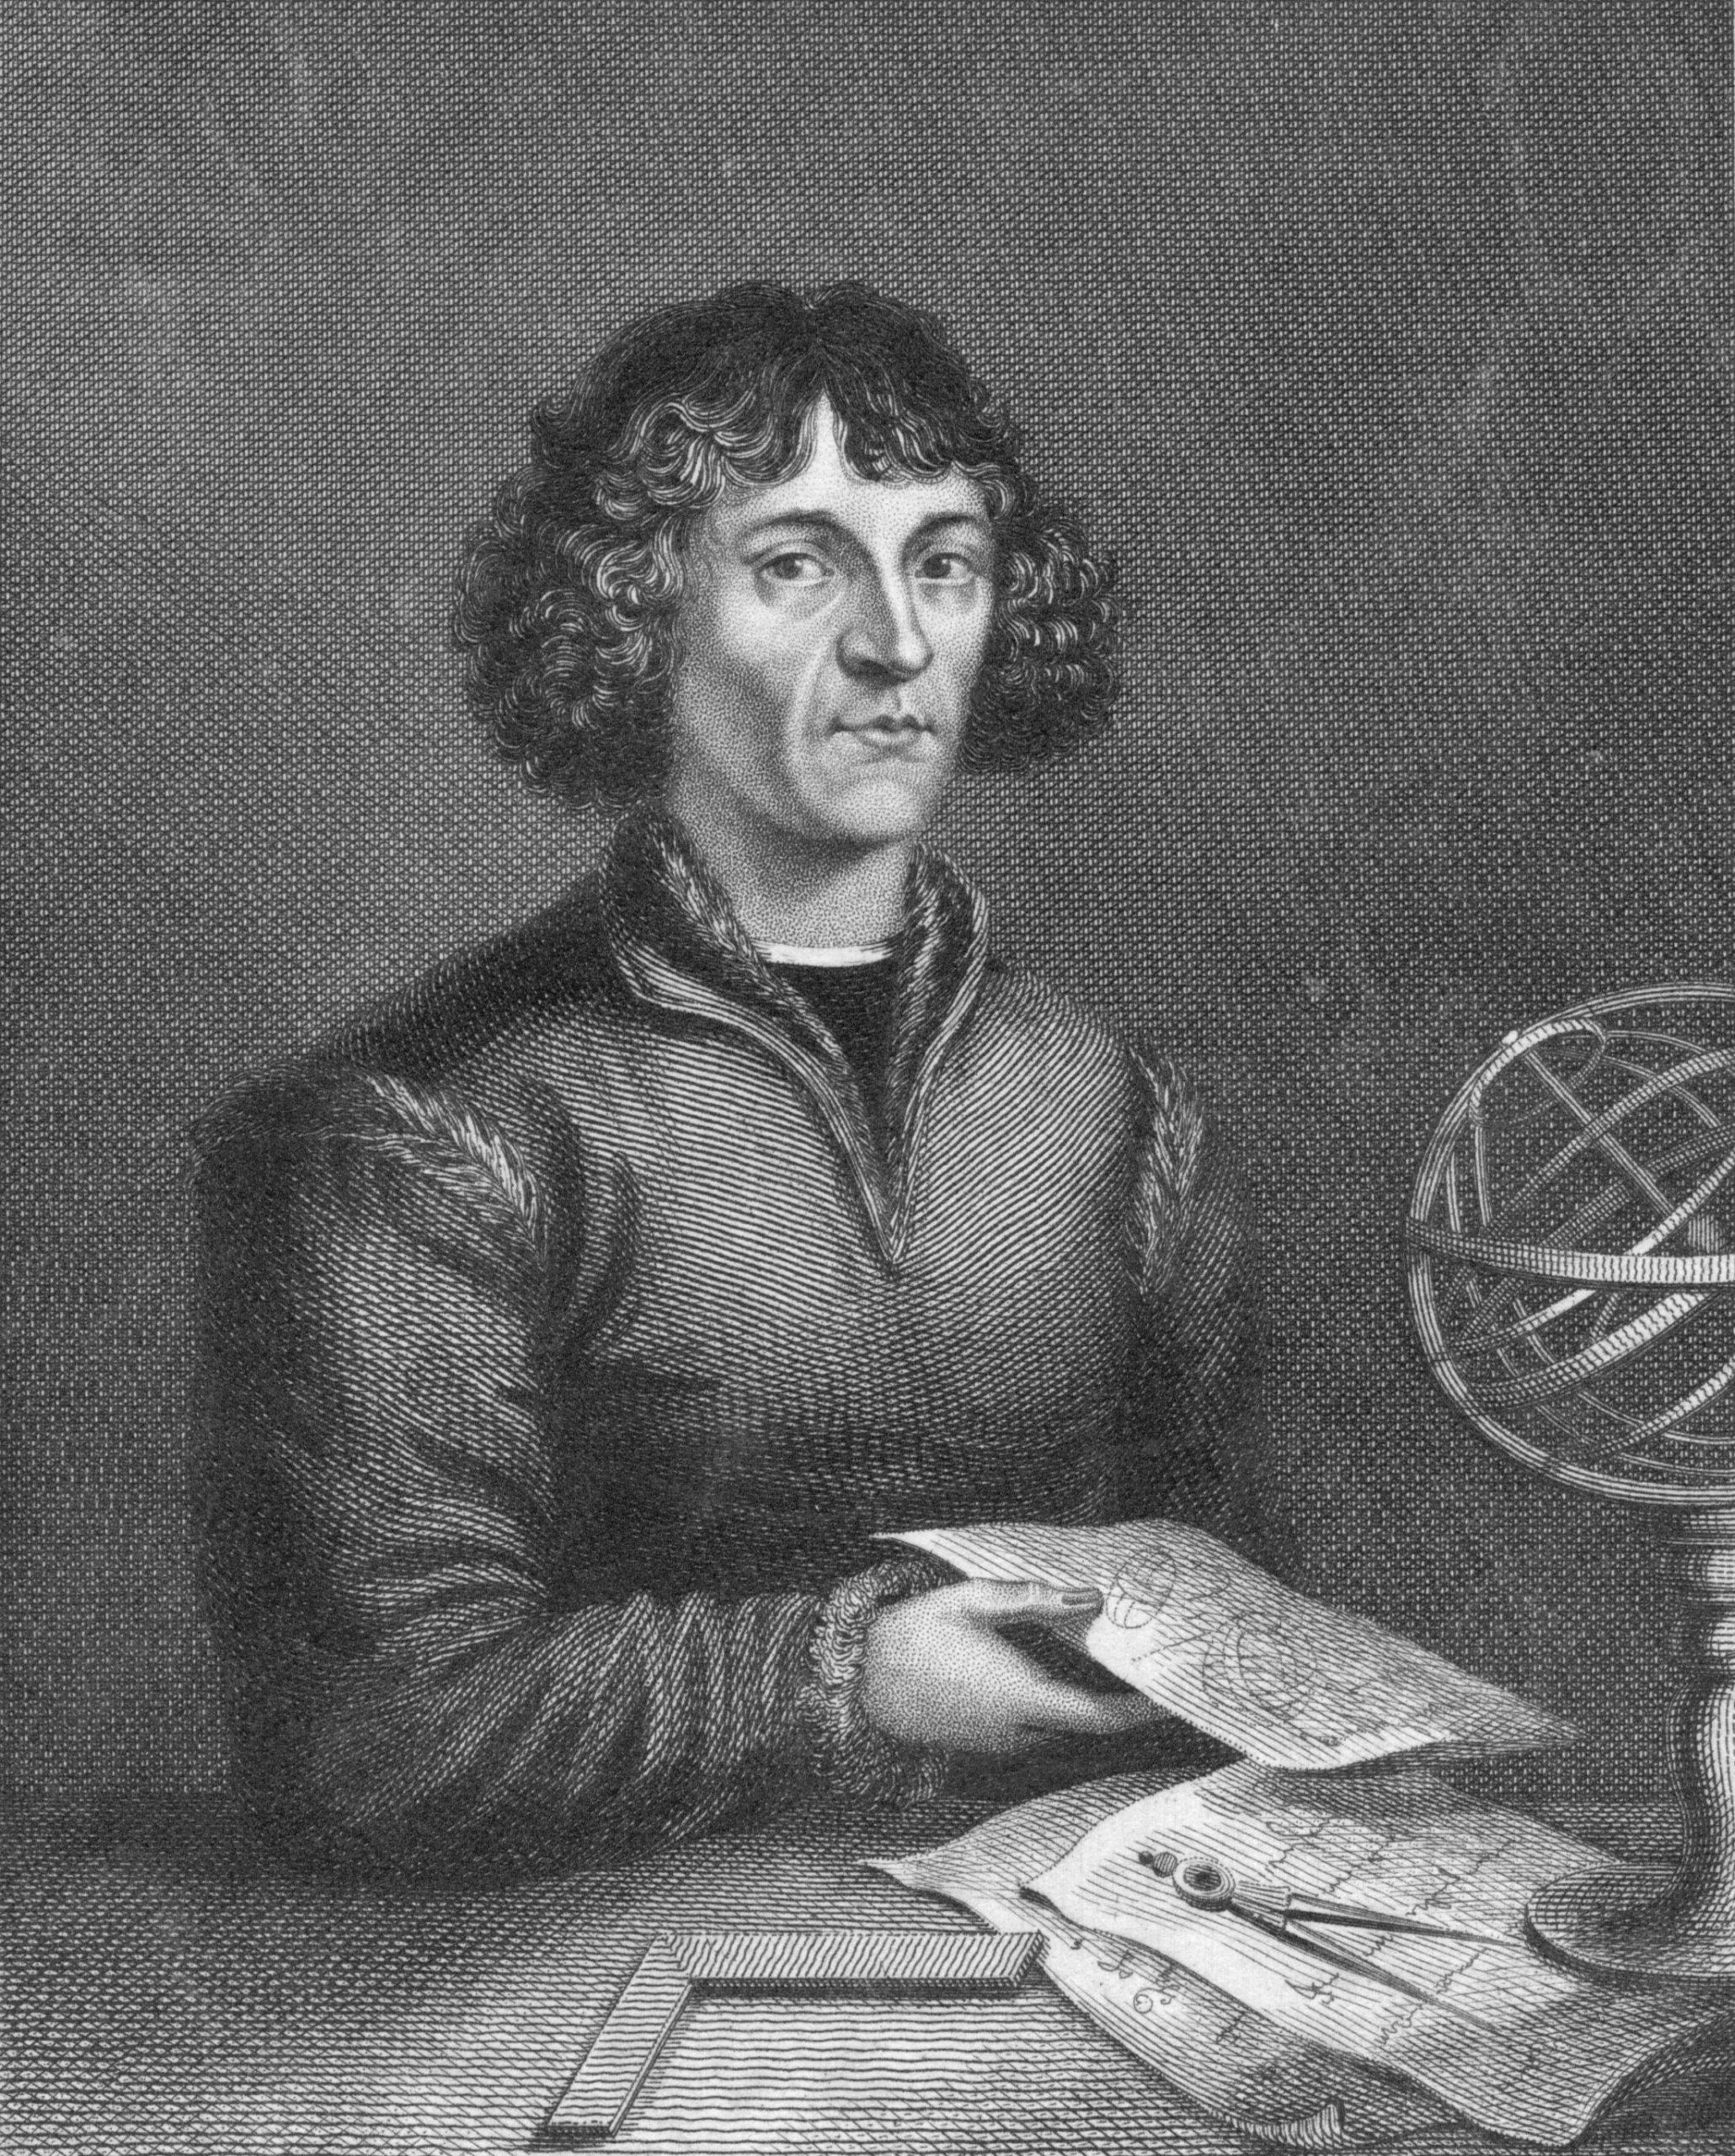 Circa 1515, Portrait of the Polish astronomer, Nicolaus Copernicus (1473 - 1543)